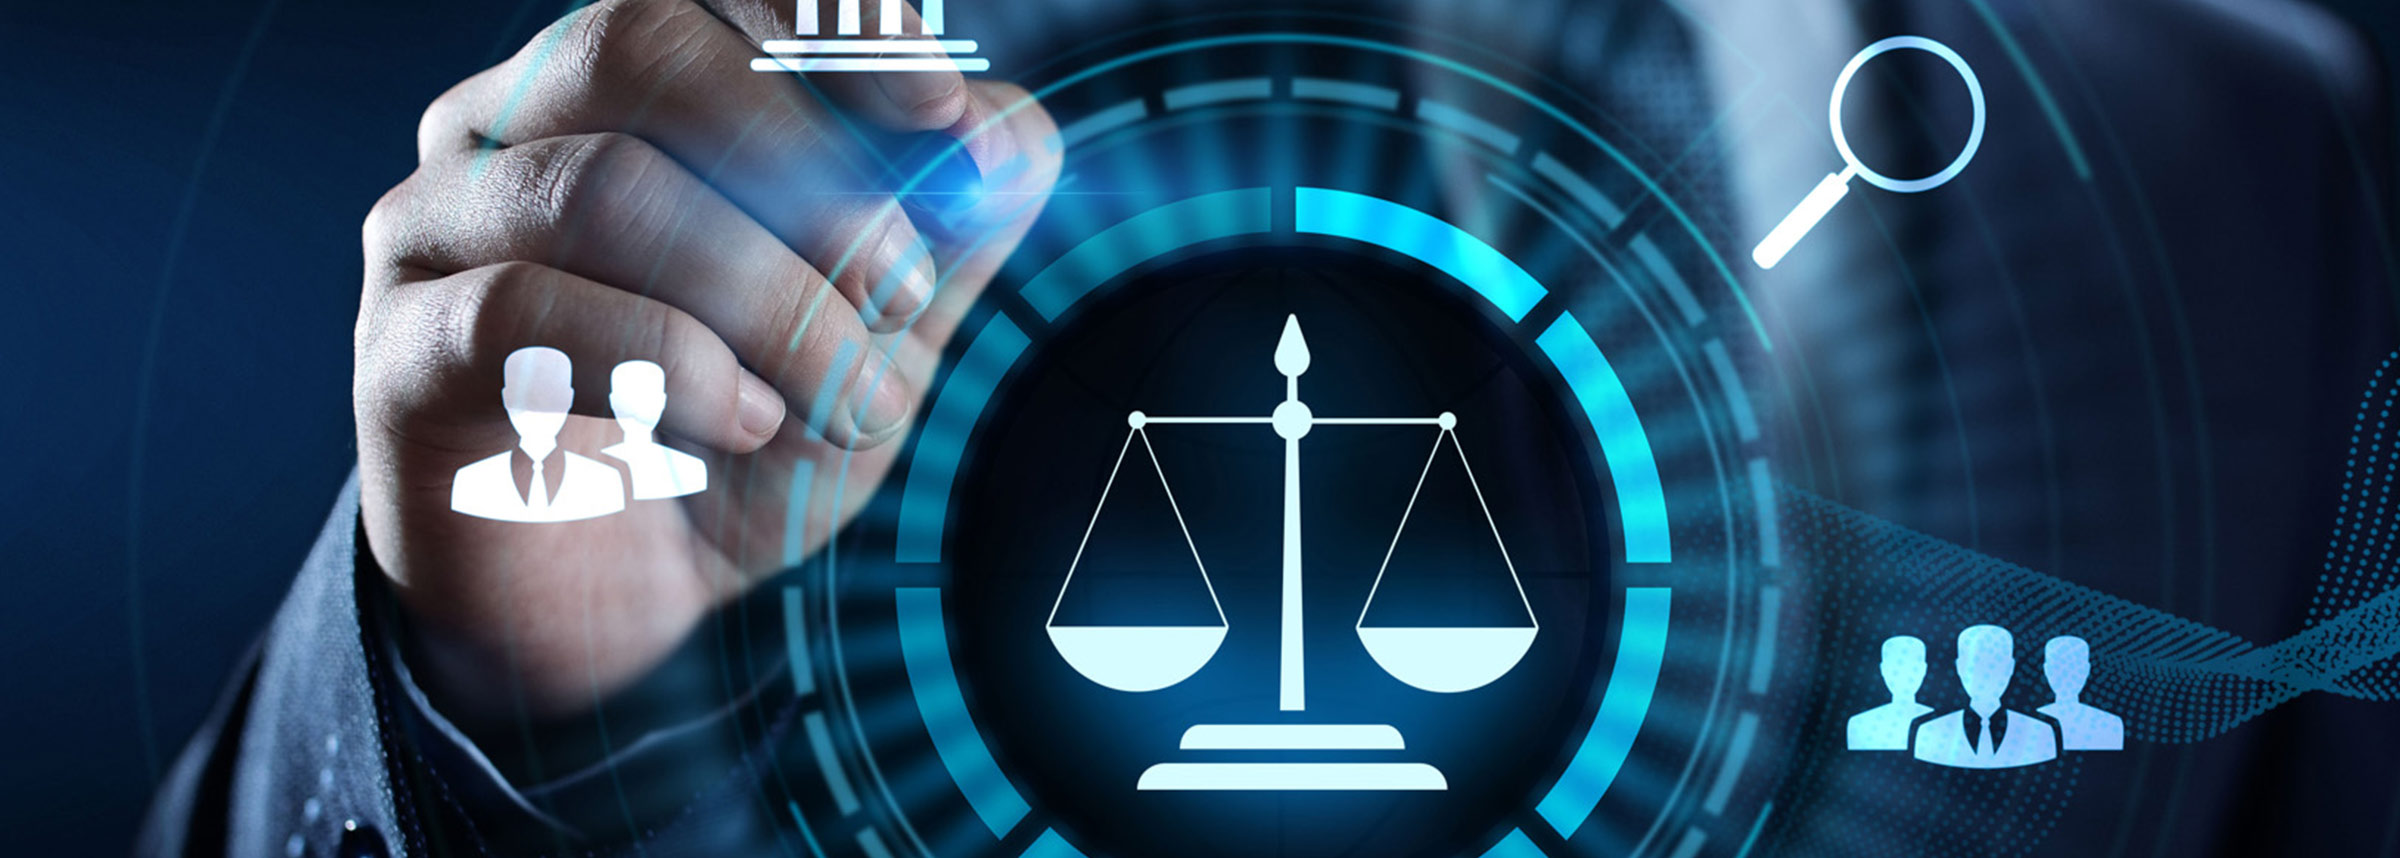 Corporate Compliance Management Solution Demo